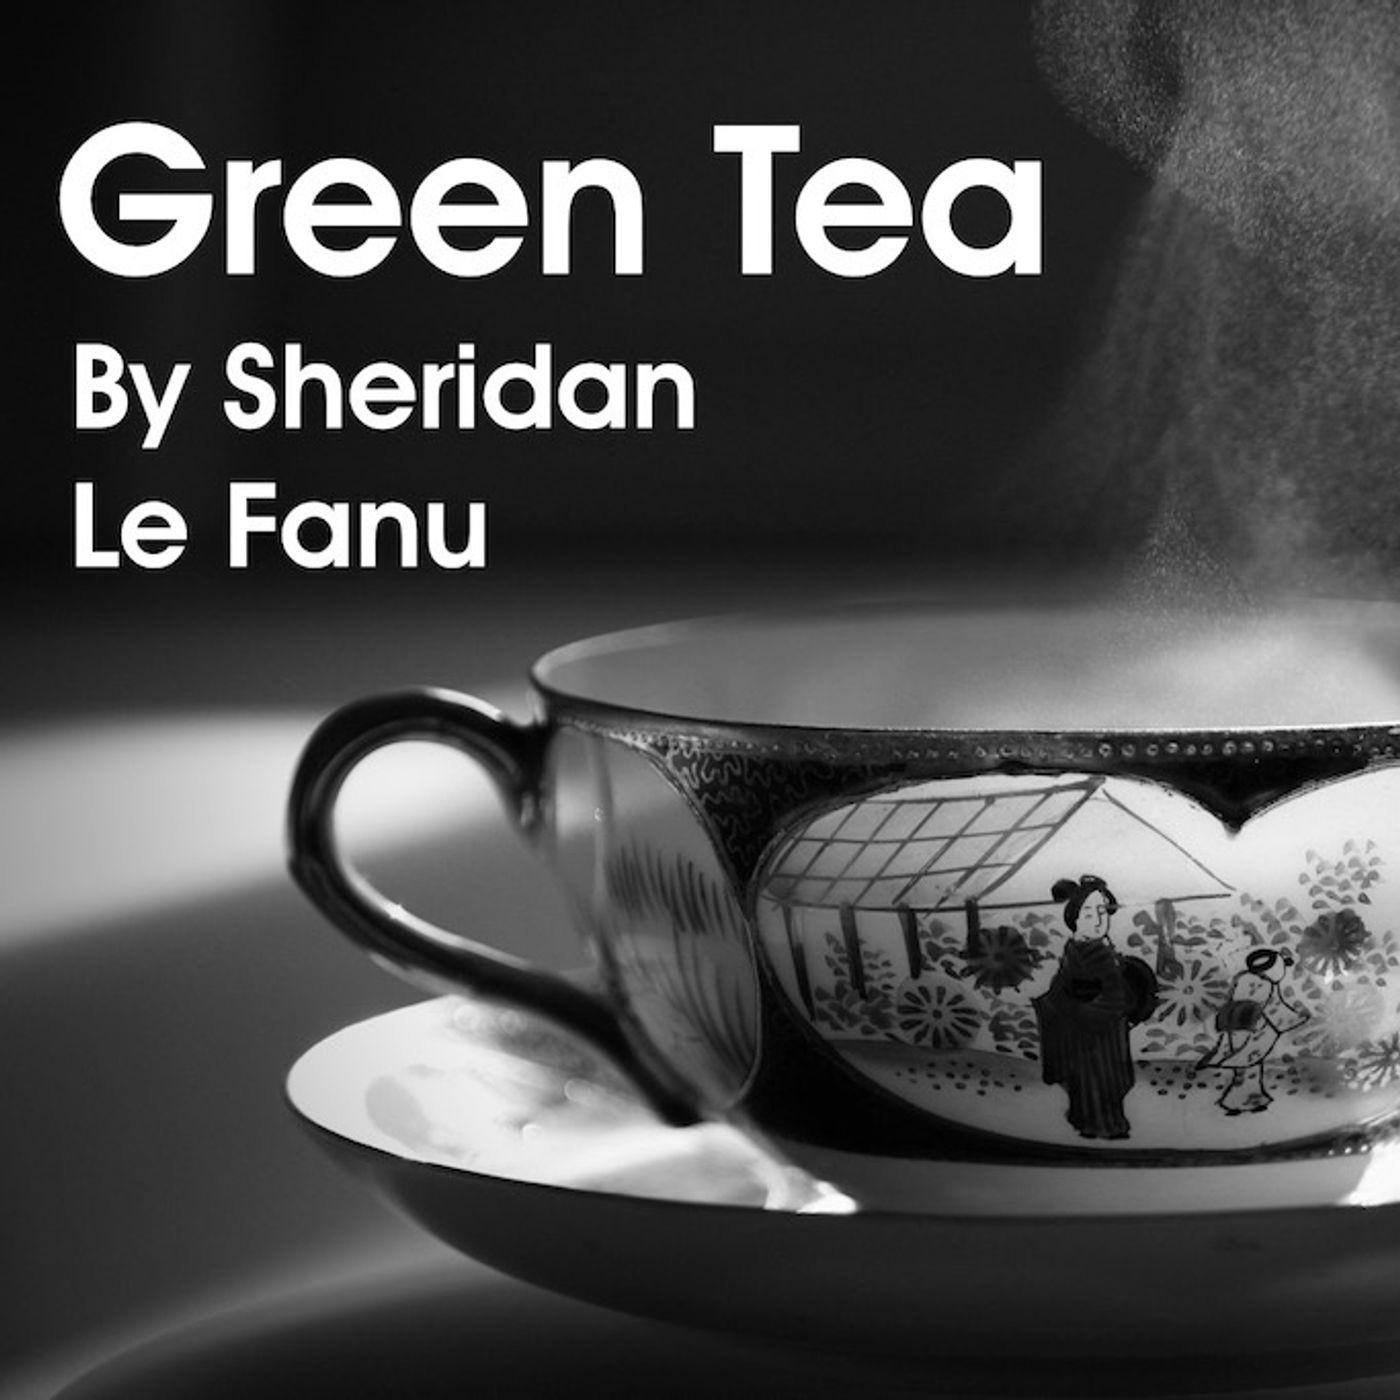 BONUS EPISODE - Green Tea by Sheridan Le Fanu